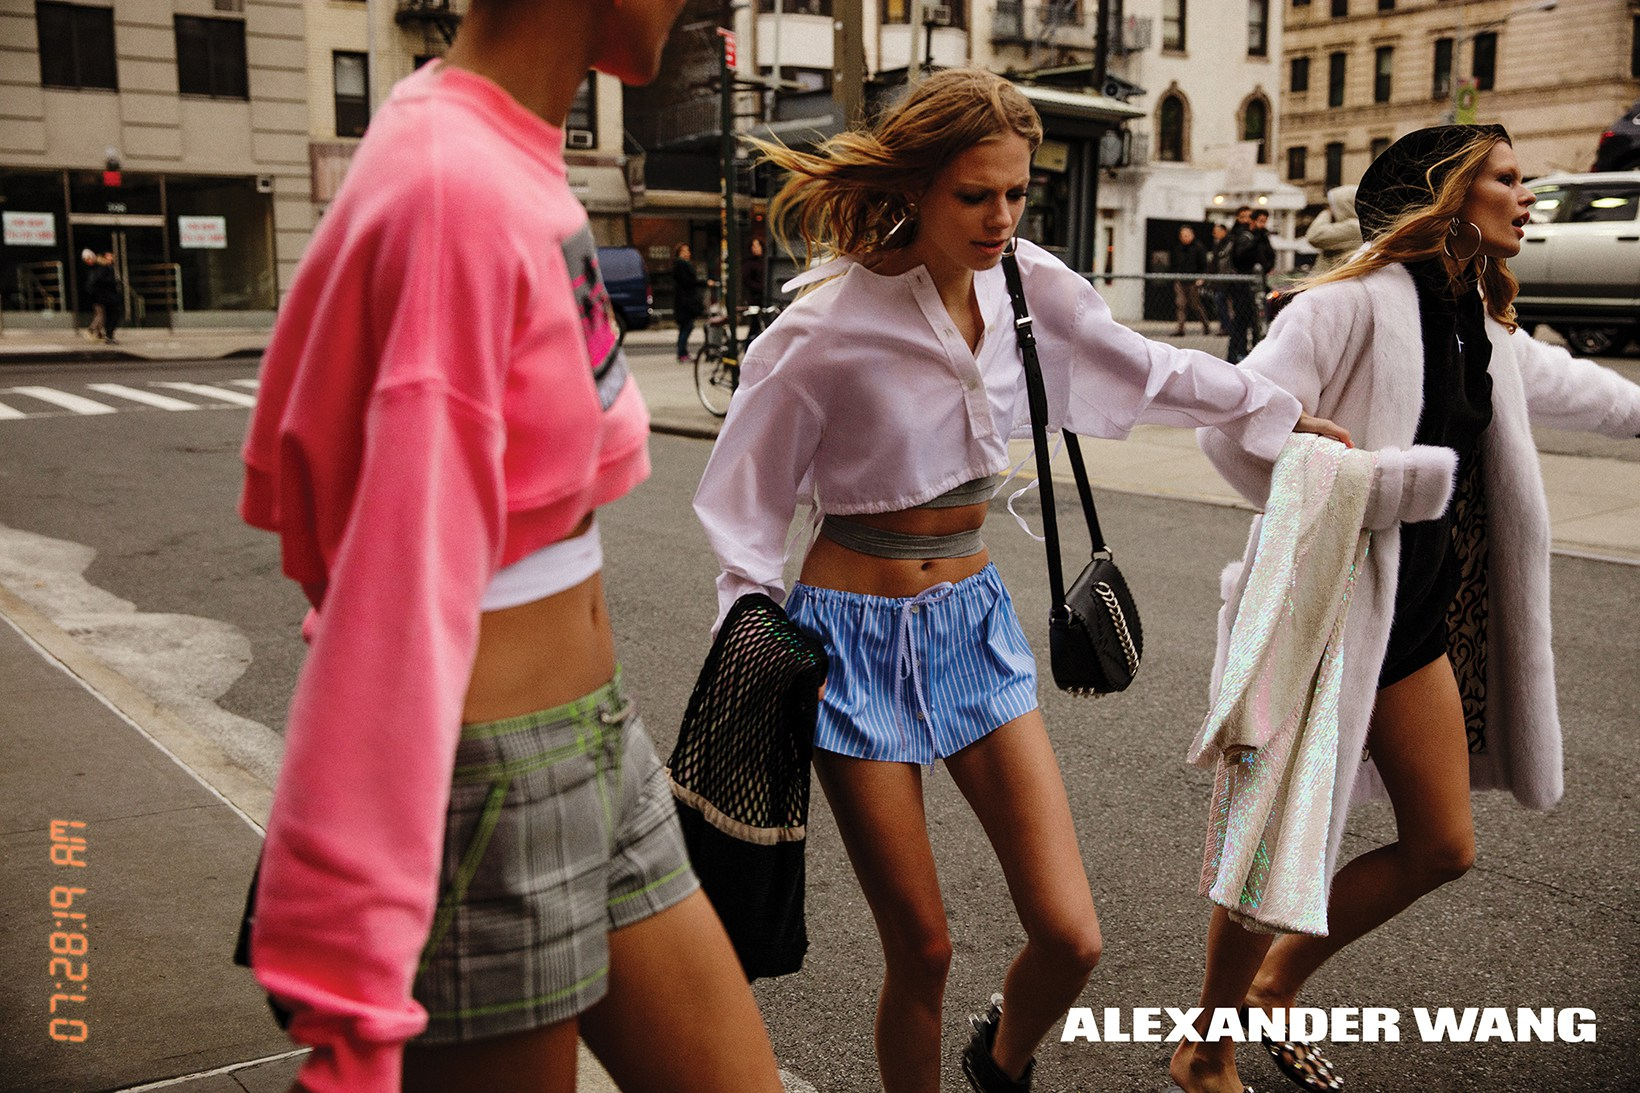 alexander-wang-inez-vinoodh-beyond-reality-campaign-9